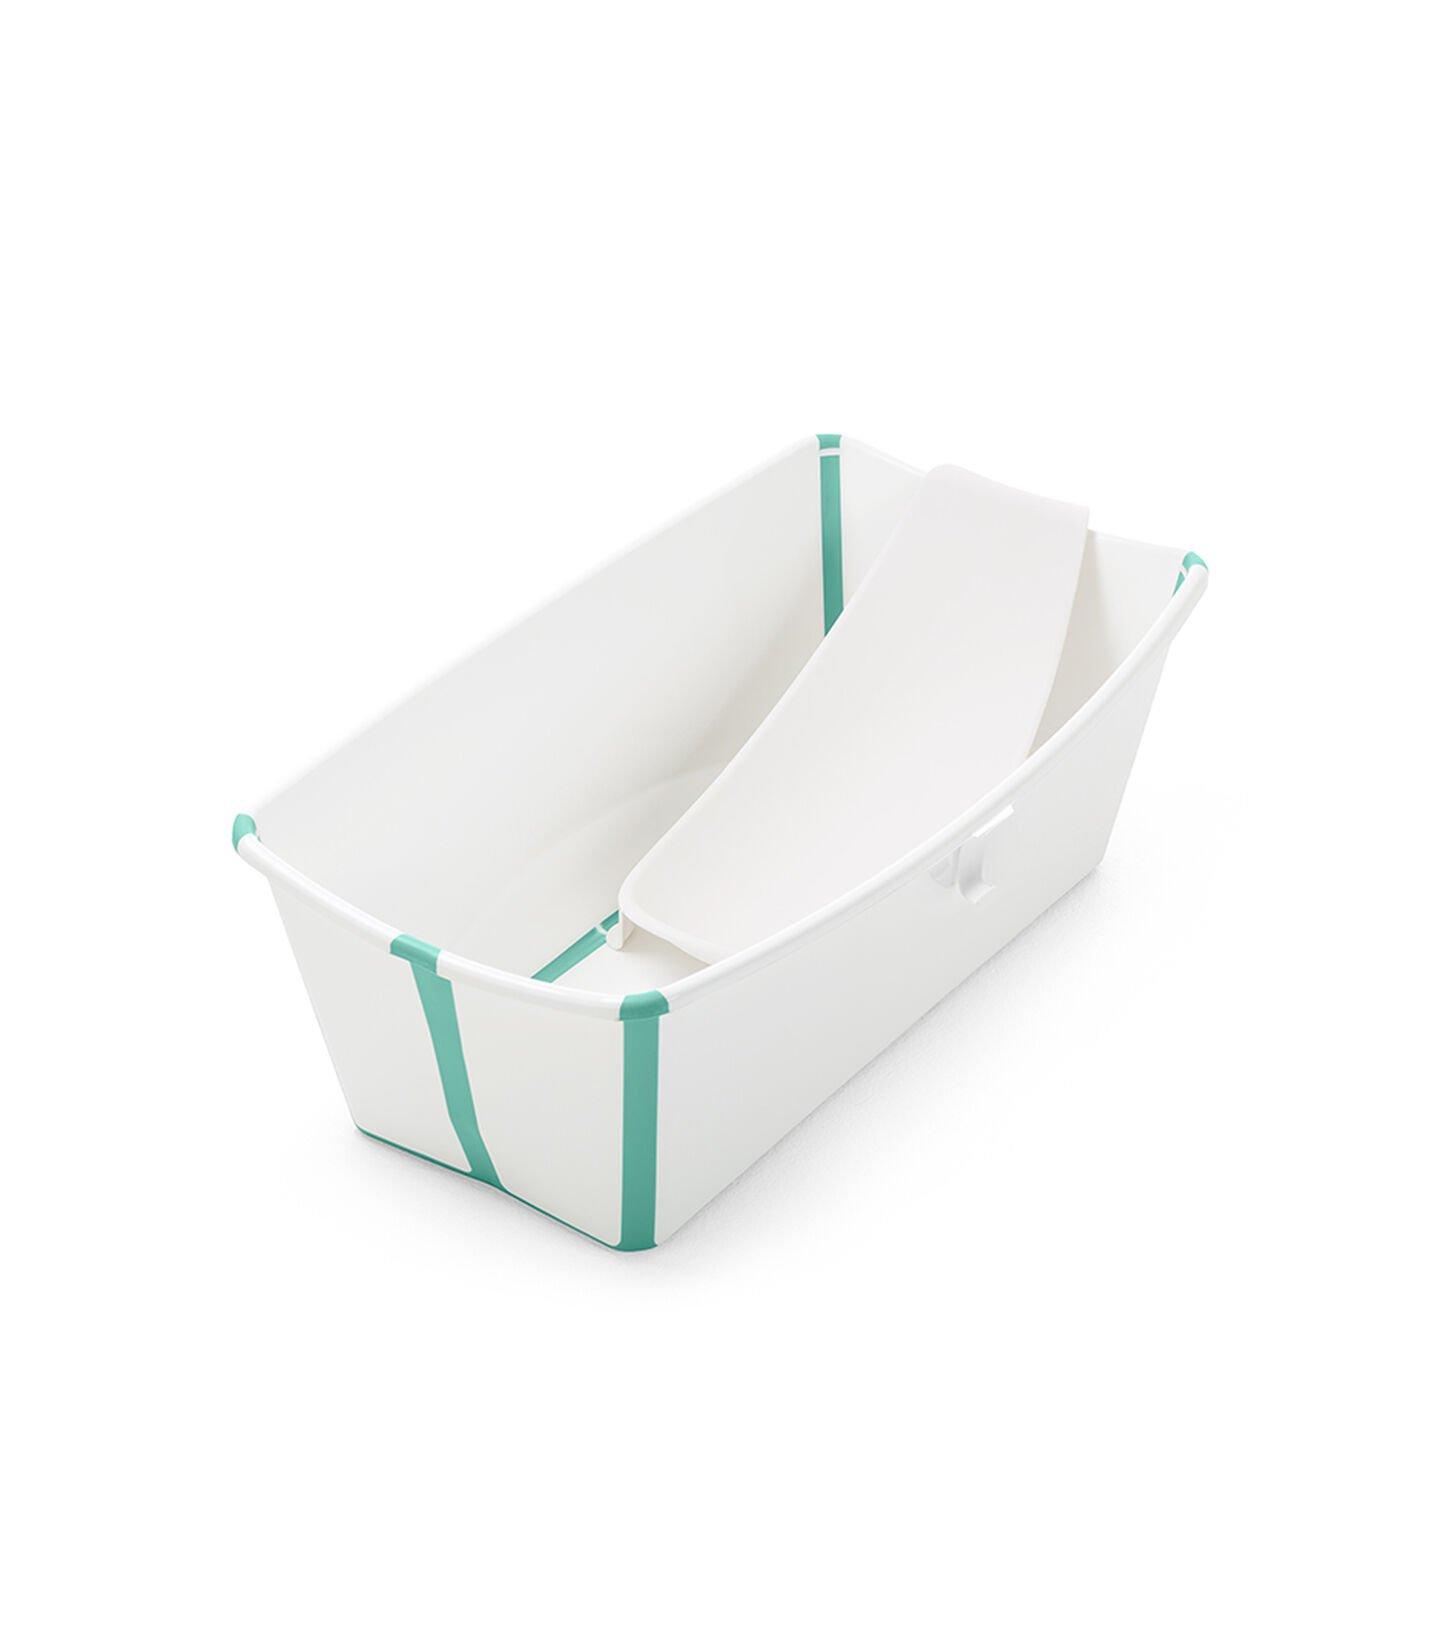 Stokke® Flexi Bath® Heat Bundle White Aqua, White Aqua, mainview view 2